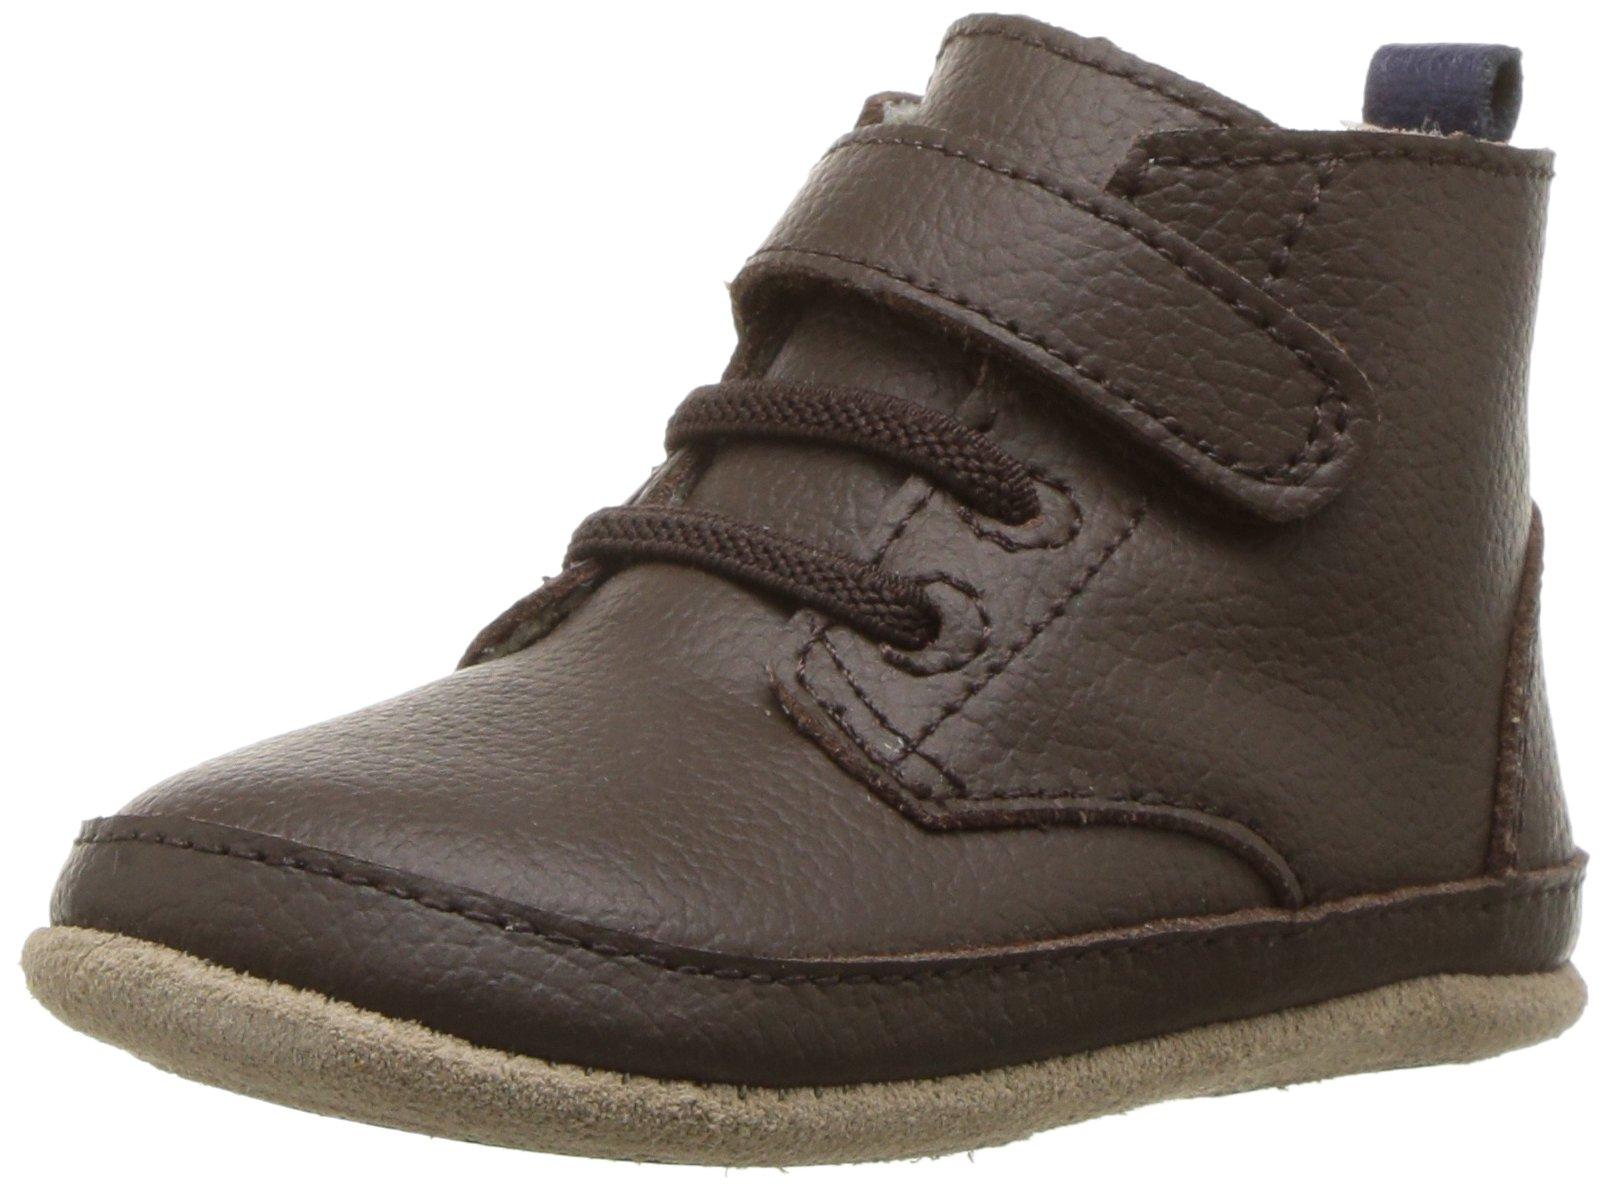 Robeez Boys' Nick Boot Crib Shoe, Nick Espresso, 9-12 Months M US Infant